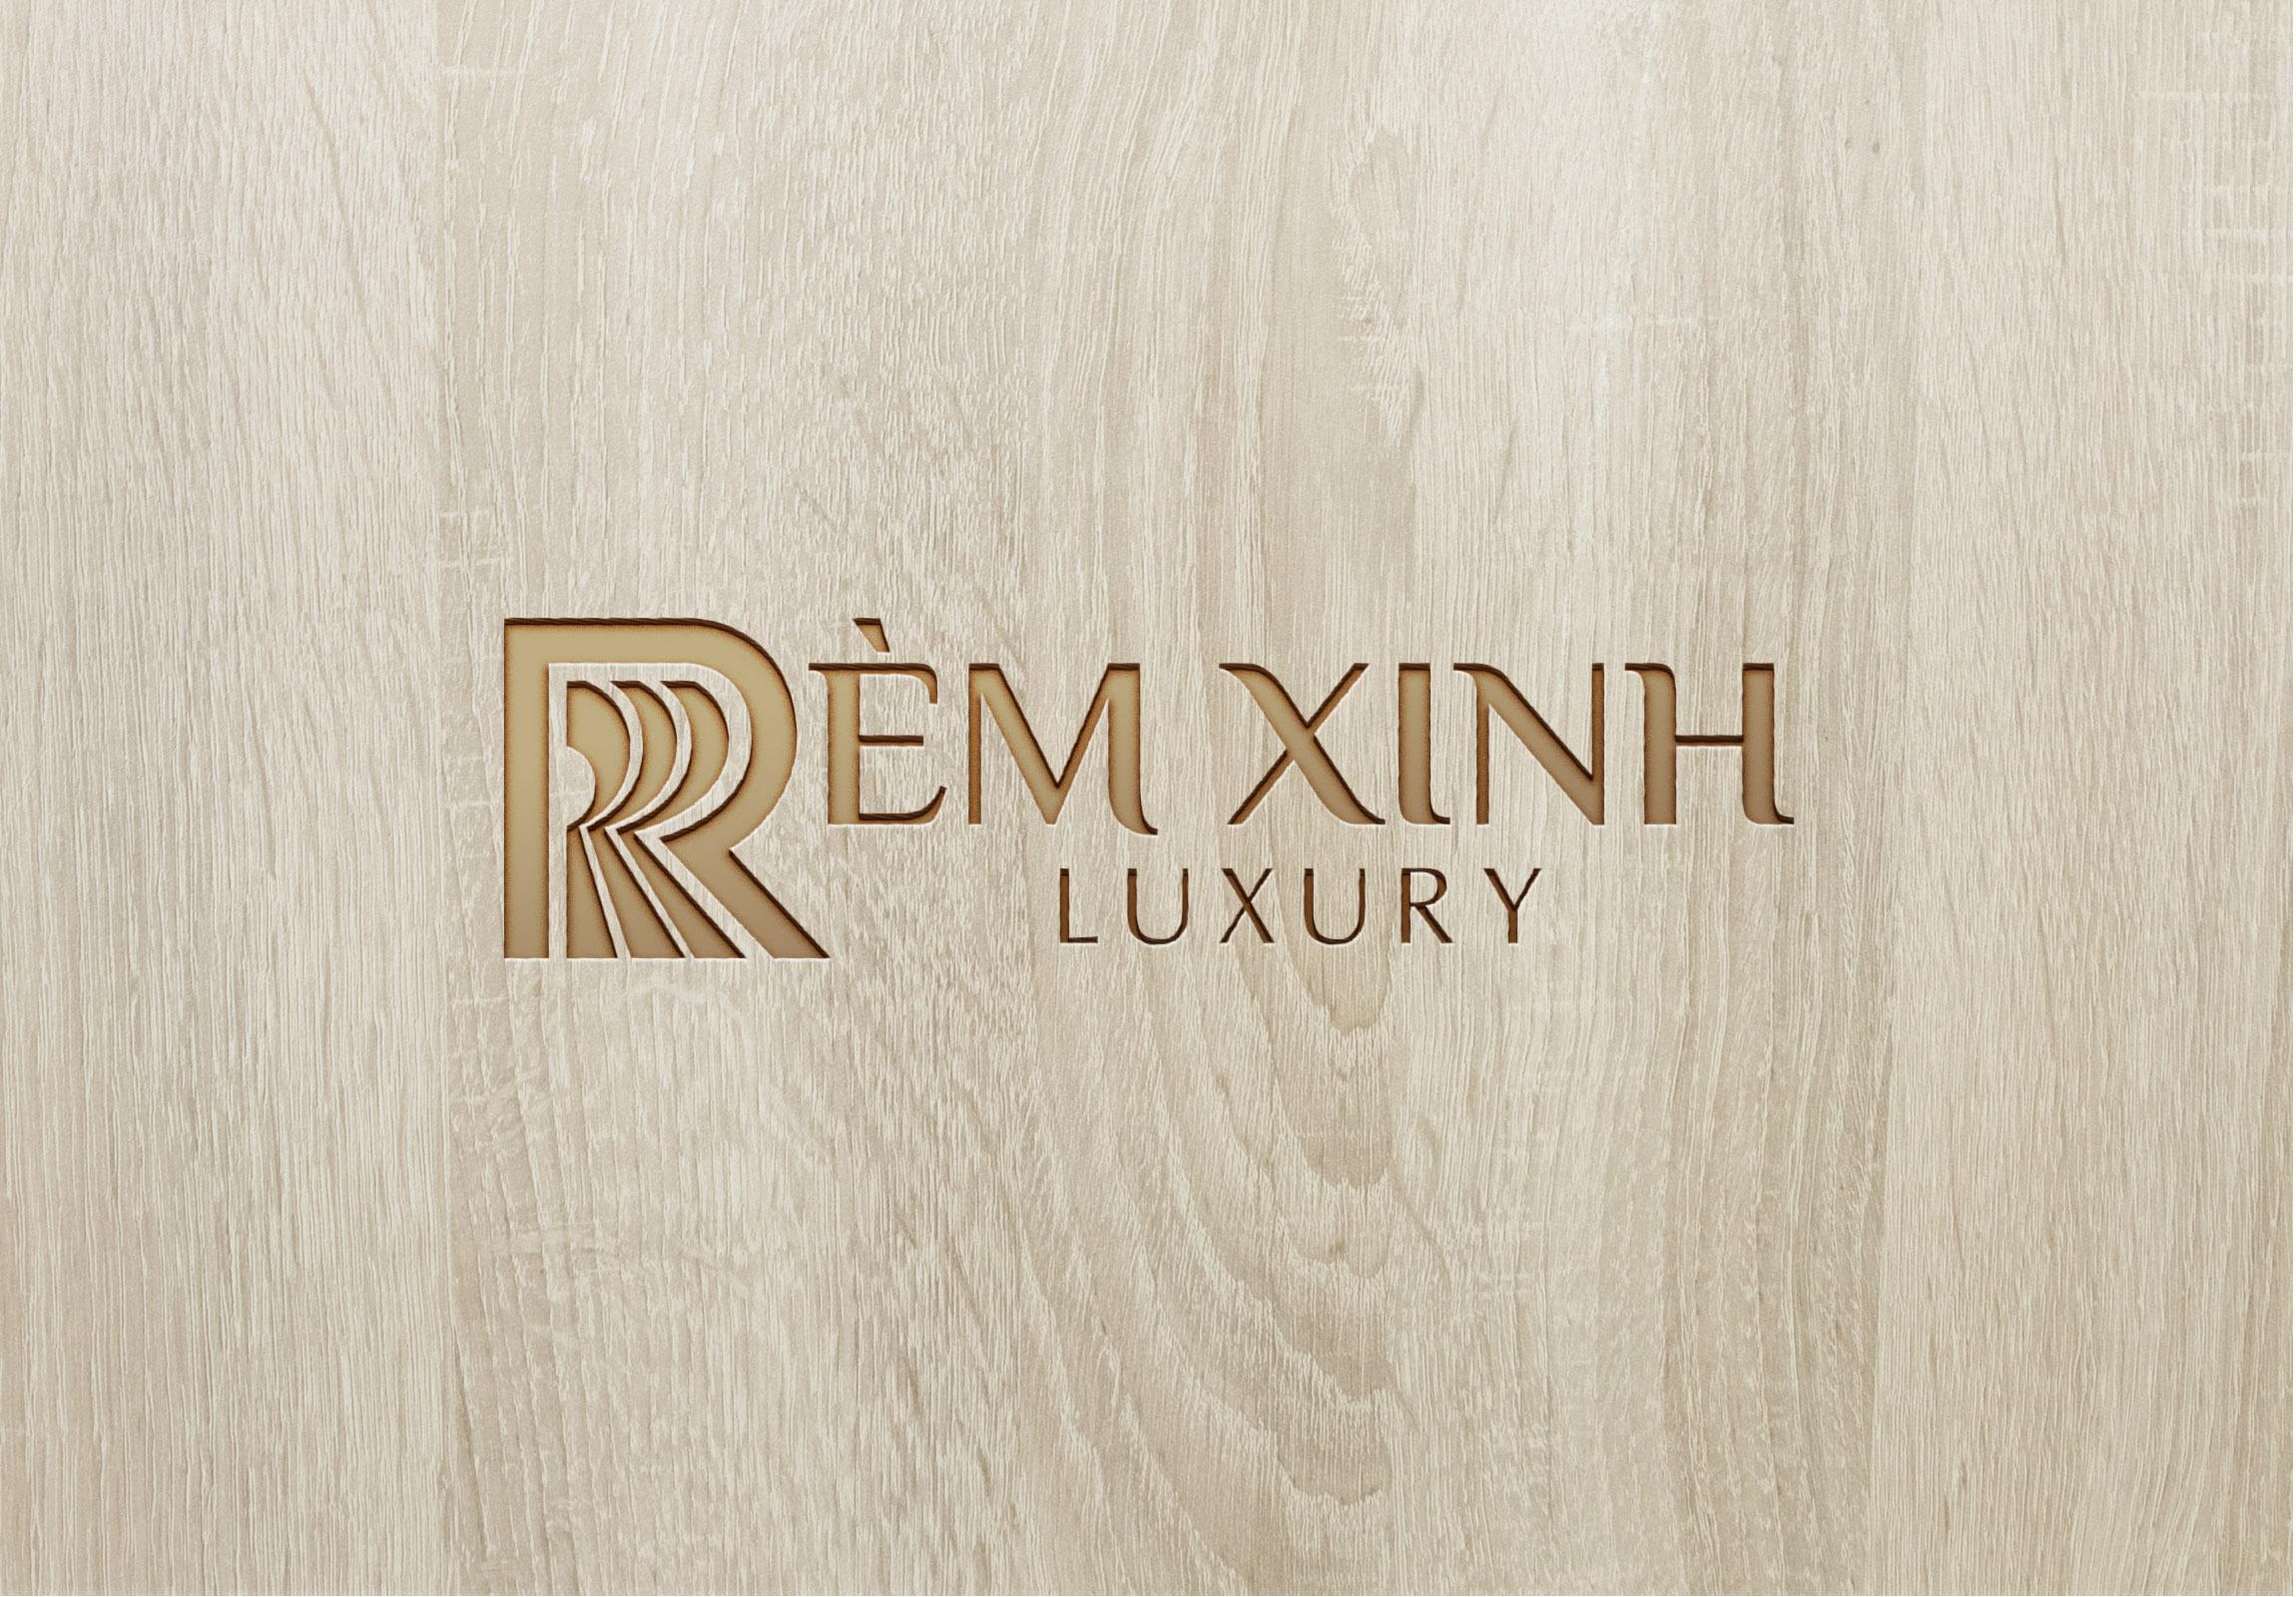 log-rem-xinh-luxury